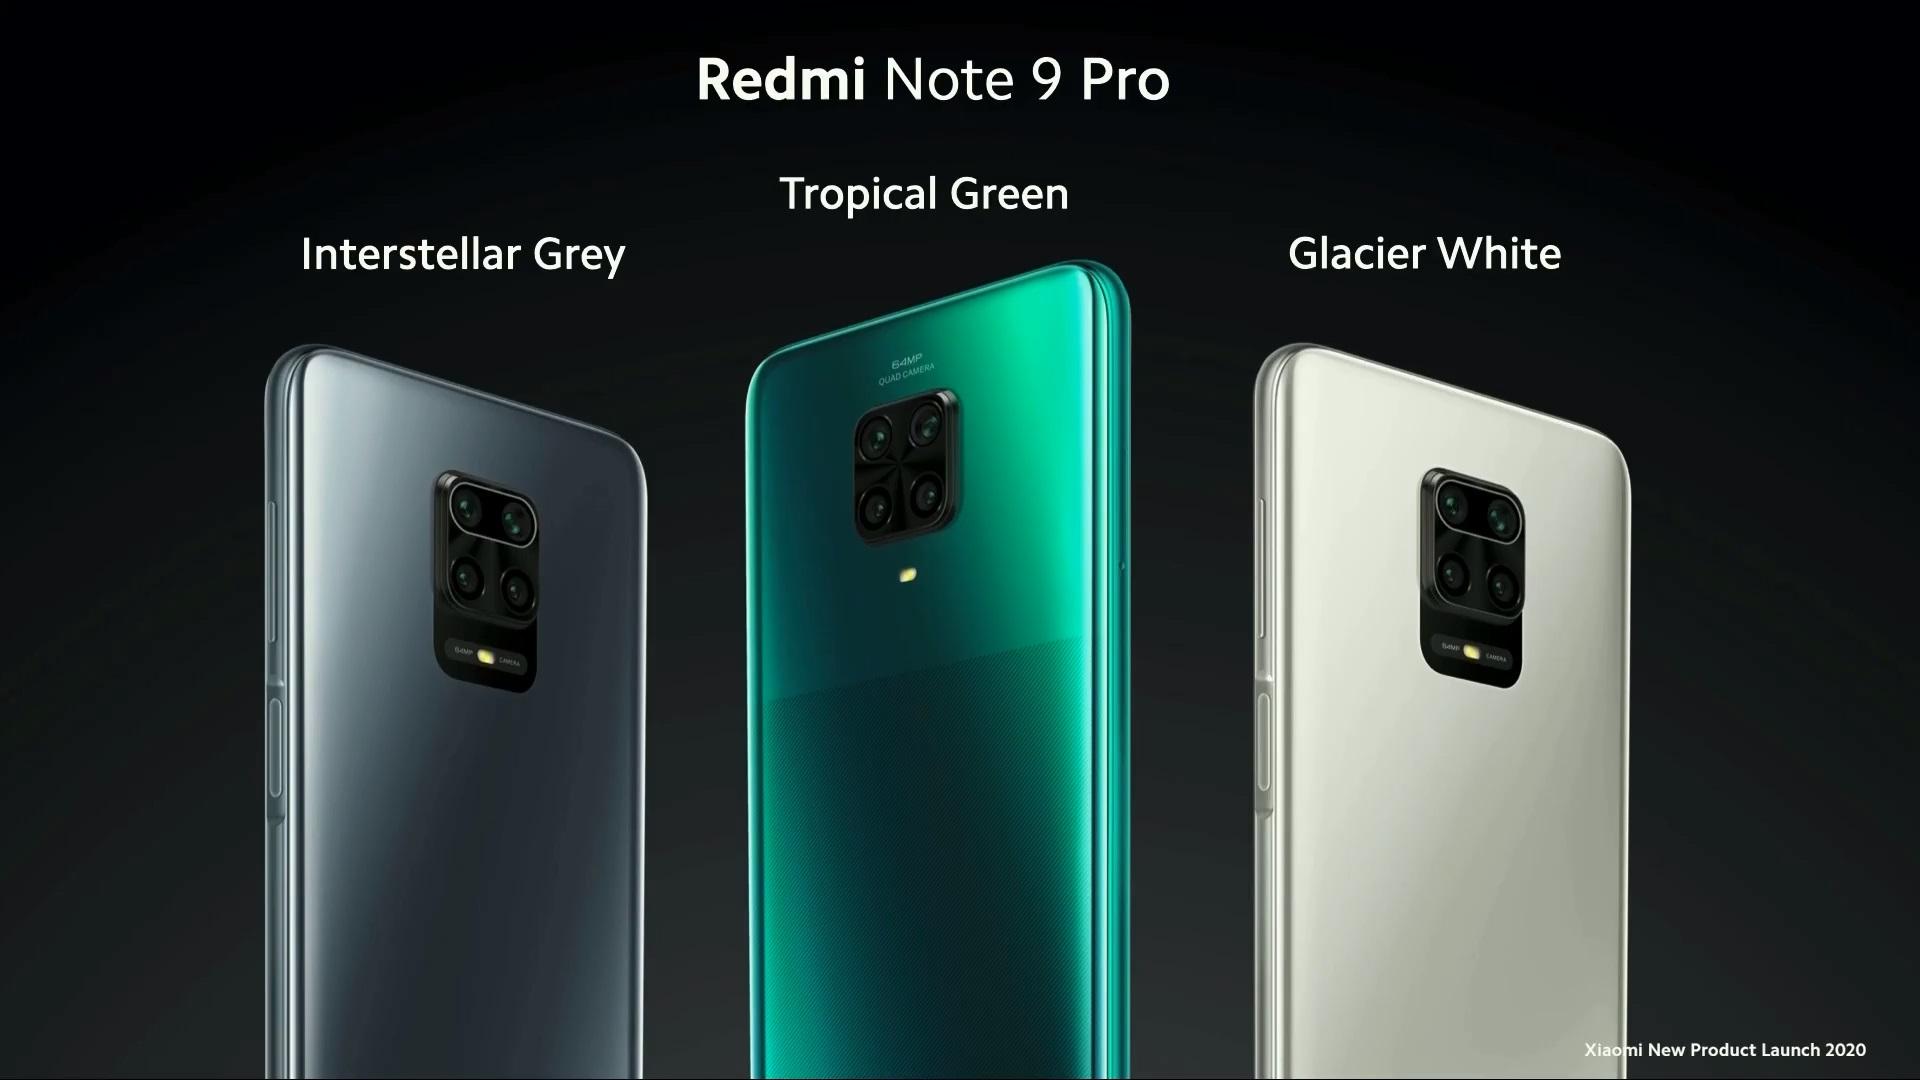 Redmi Note 9 Pro Global